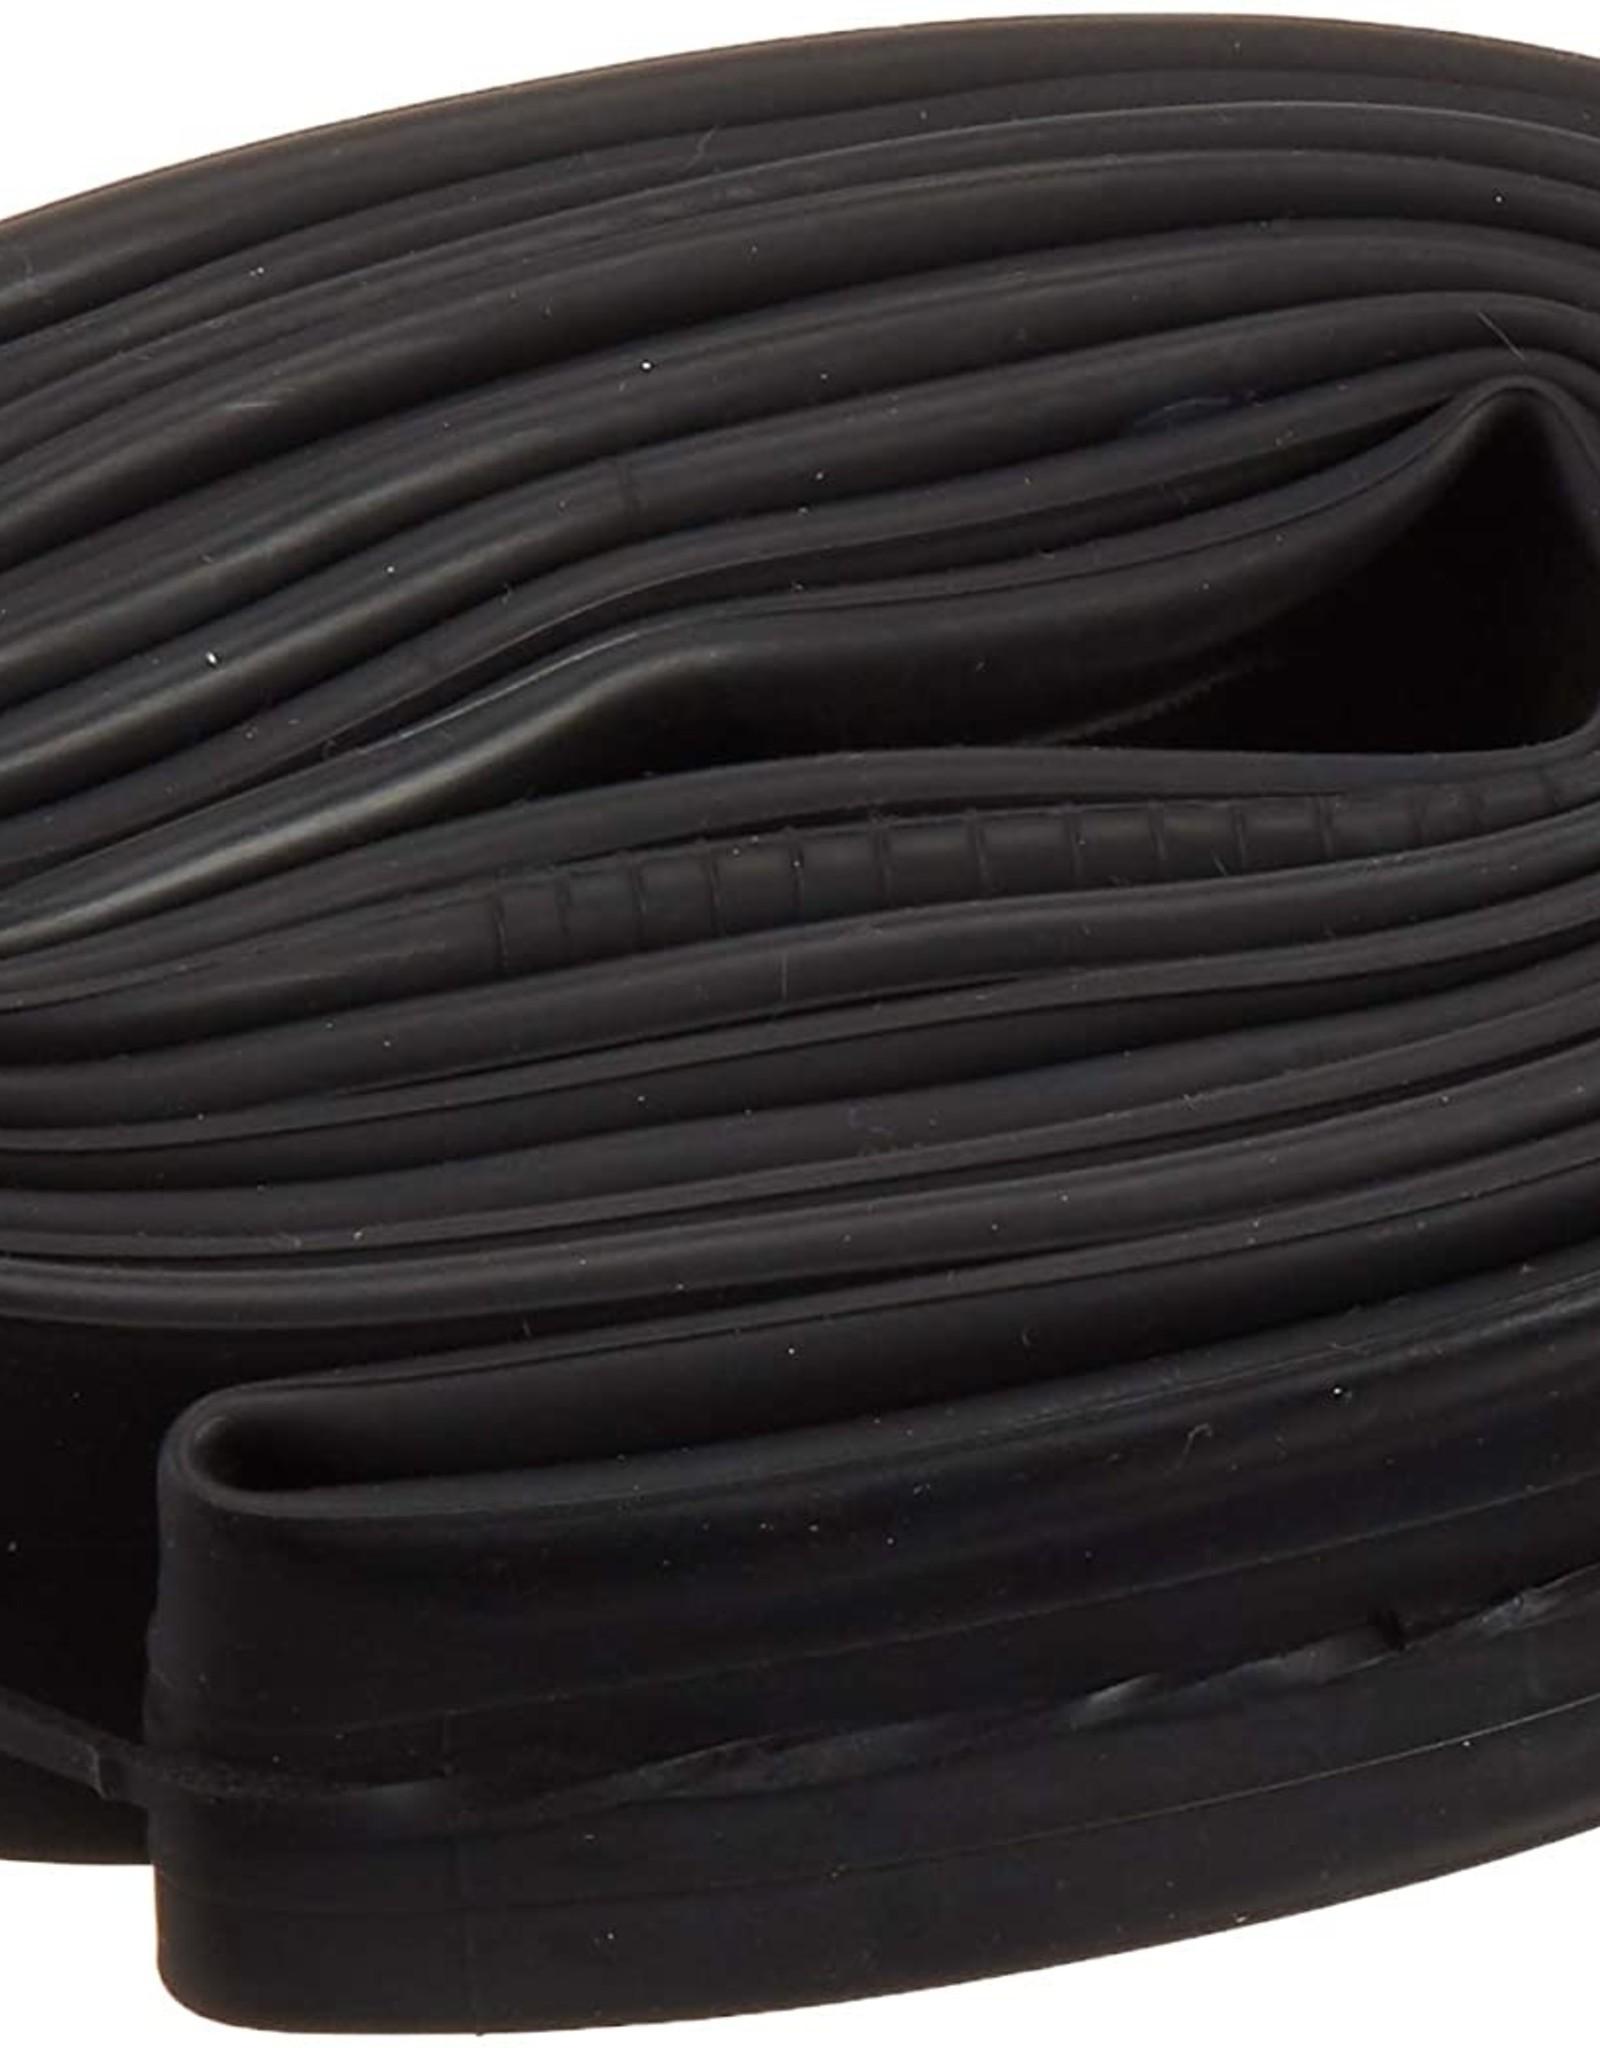 Online Tubes SUNLT UTILIT BULK 700x25-32 (27x1-1/8x1-1/4) Presta 48mm PAIR